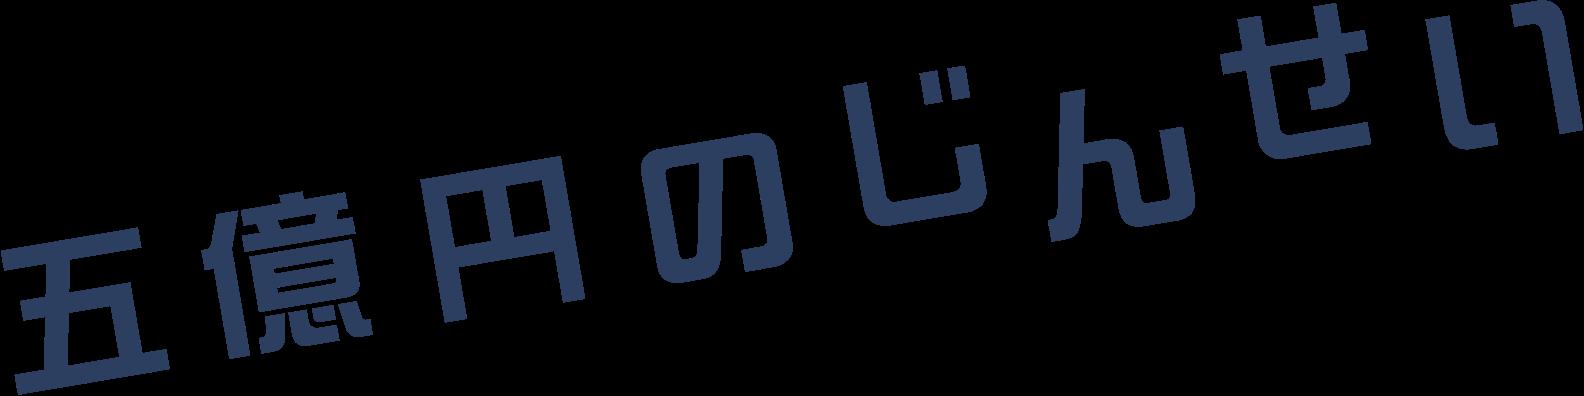 GYAOで「5億円のじんせい」の舞台挨拶&封切り前にWeb上で本編まるごと公開の完成披露試写会を開催予定。本日18:30~。